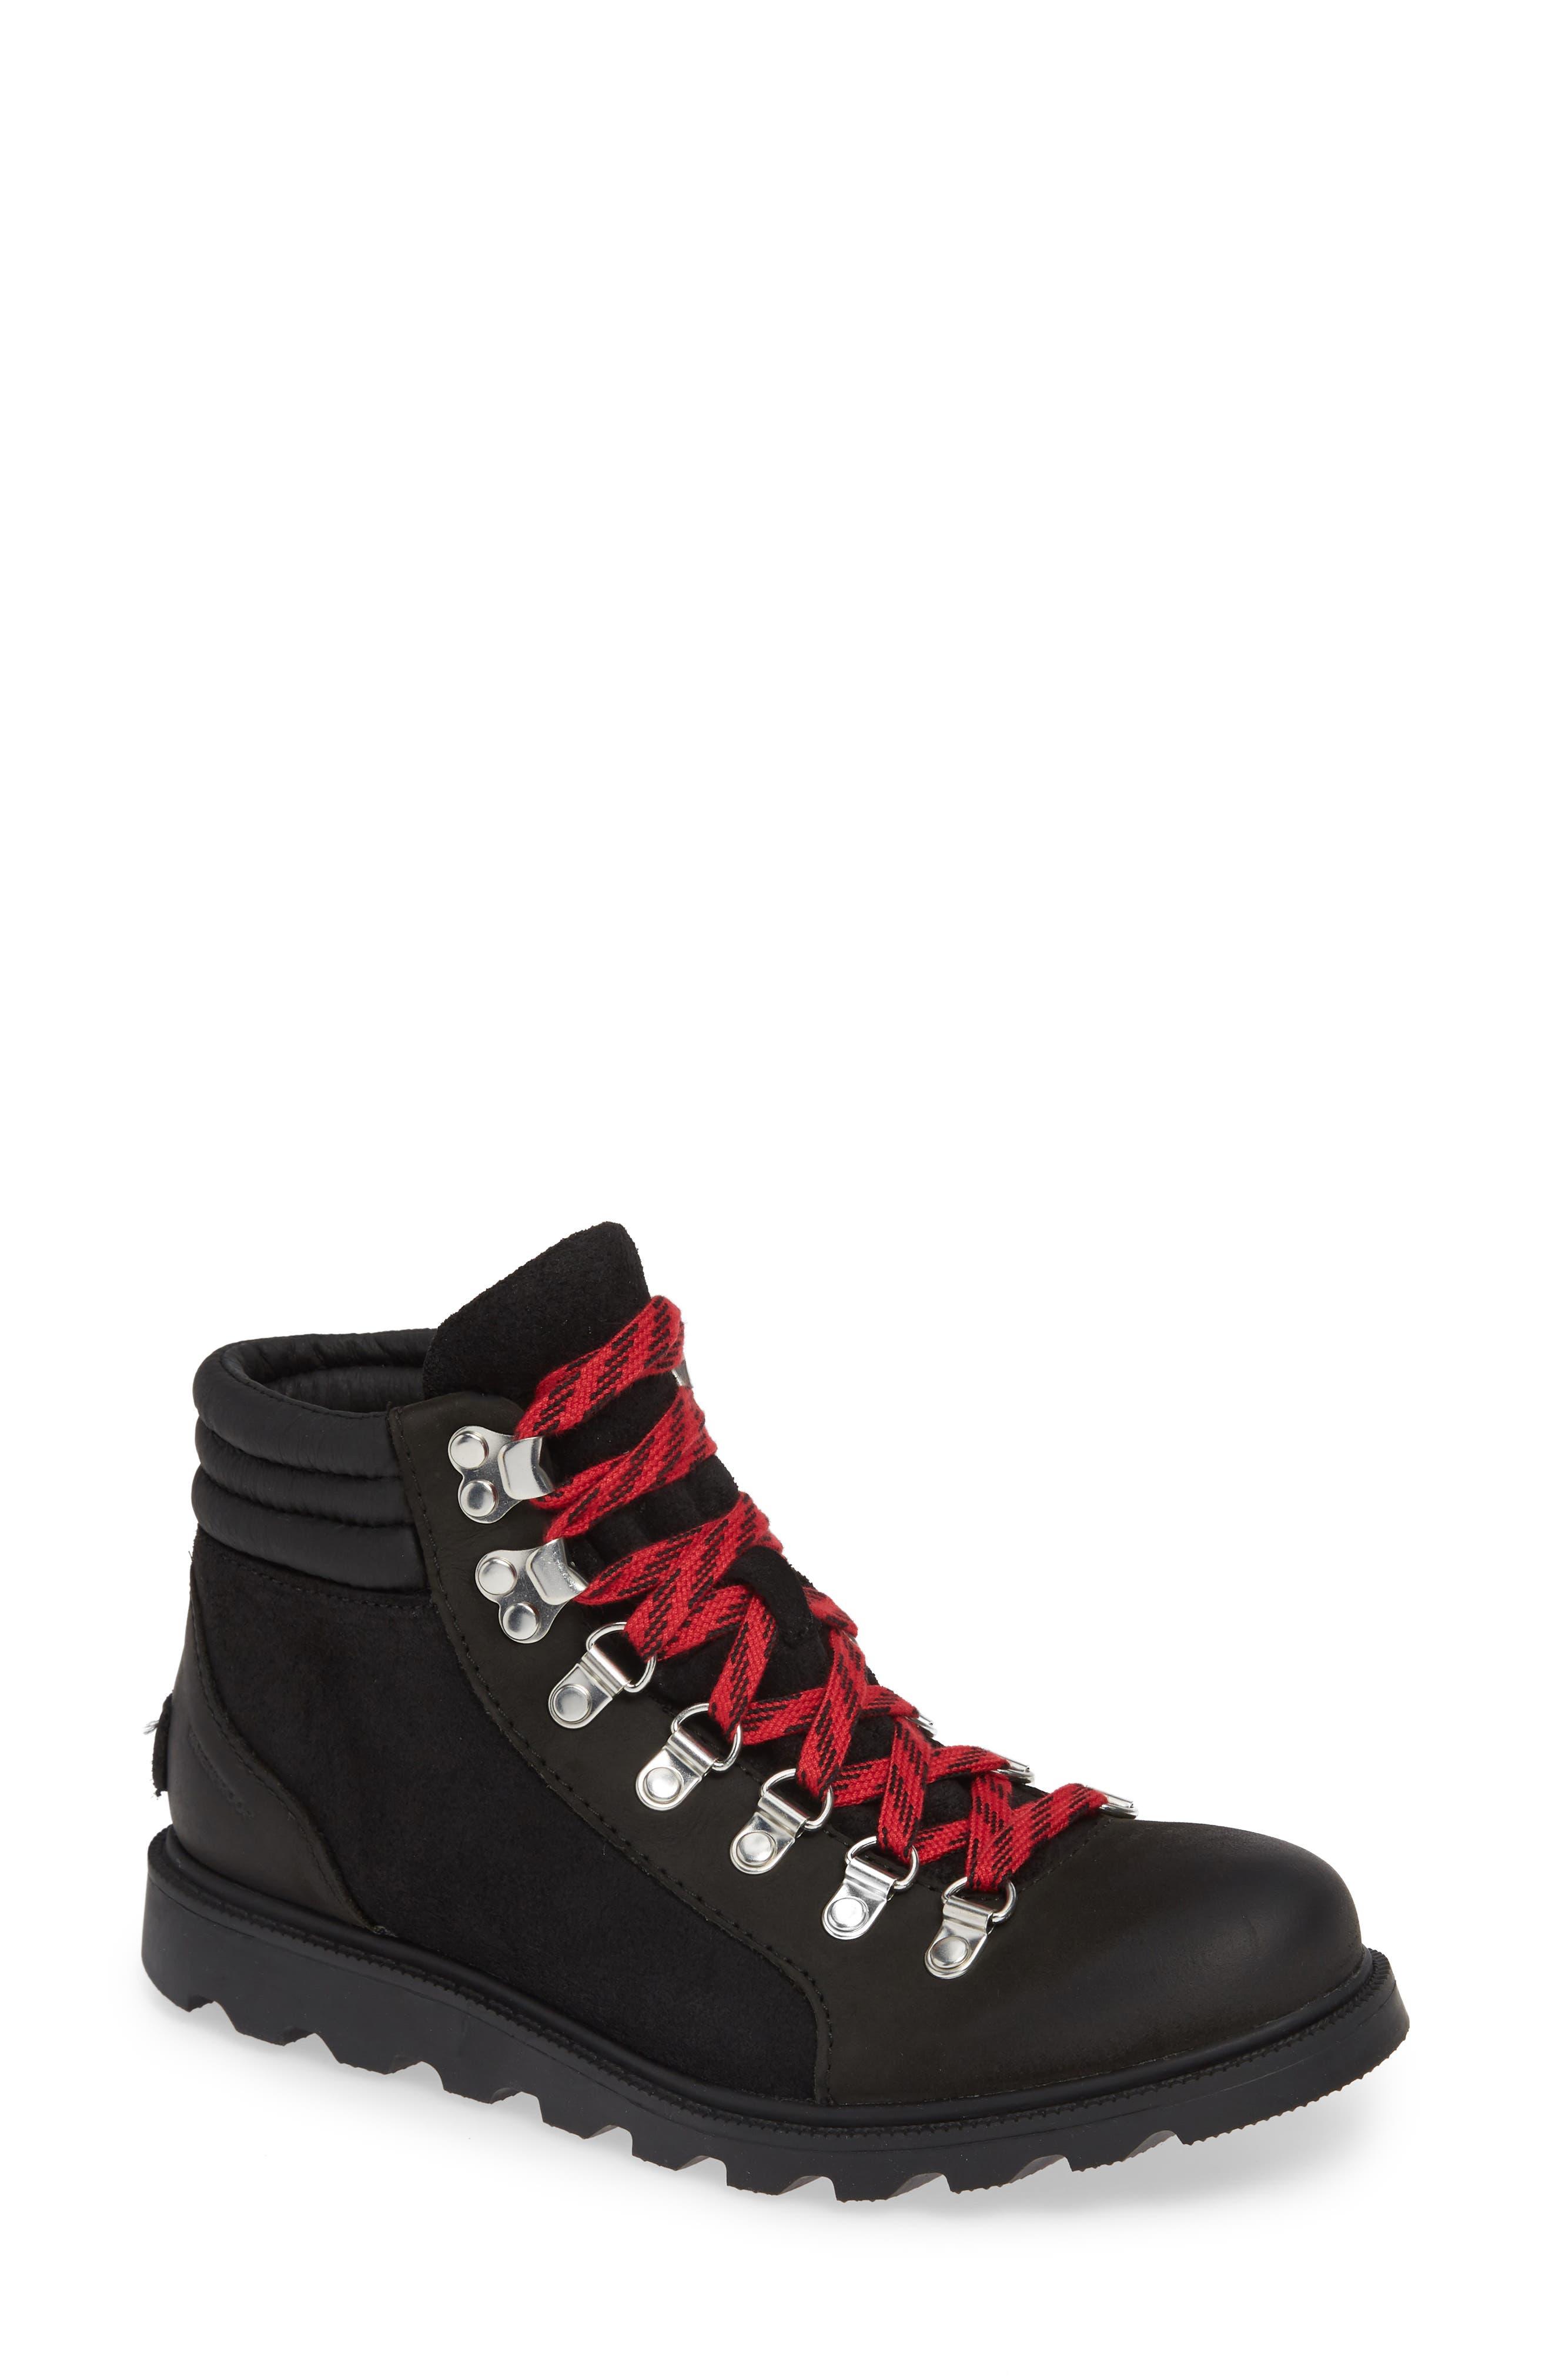 SOREL Ainsley Conquest Waterproof Boot, Main, color, BLACK/ BLACK